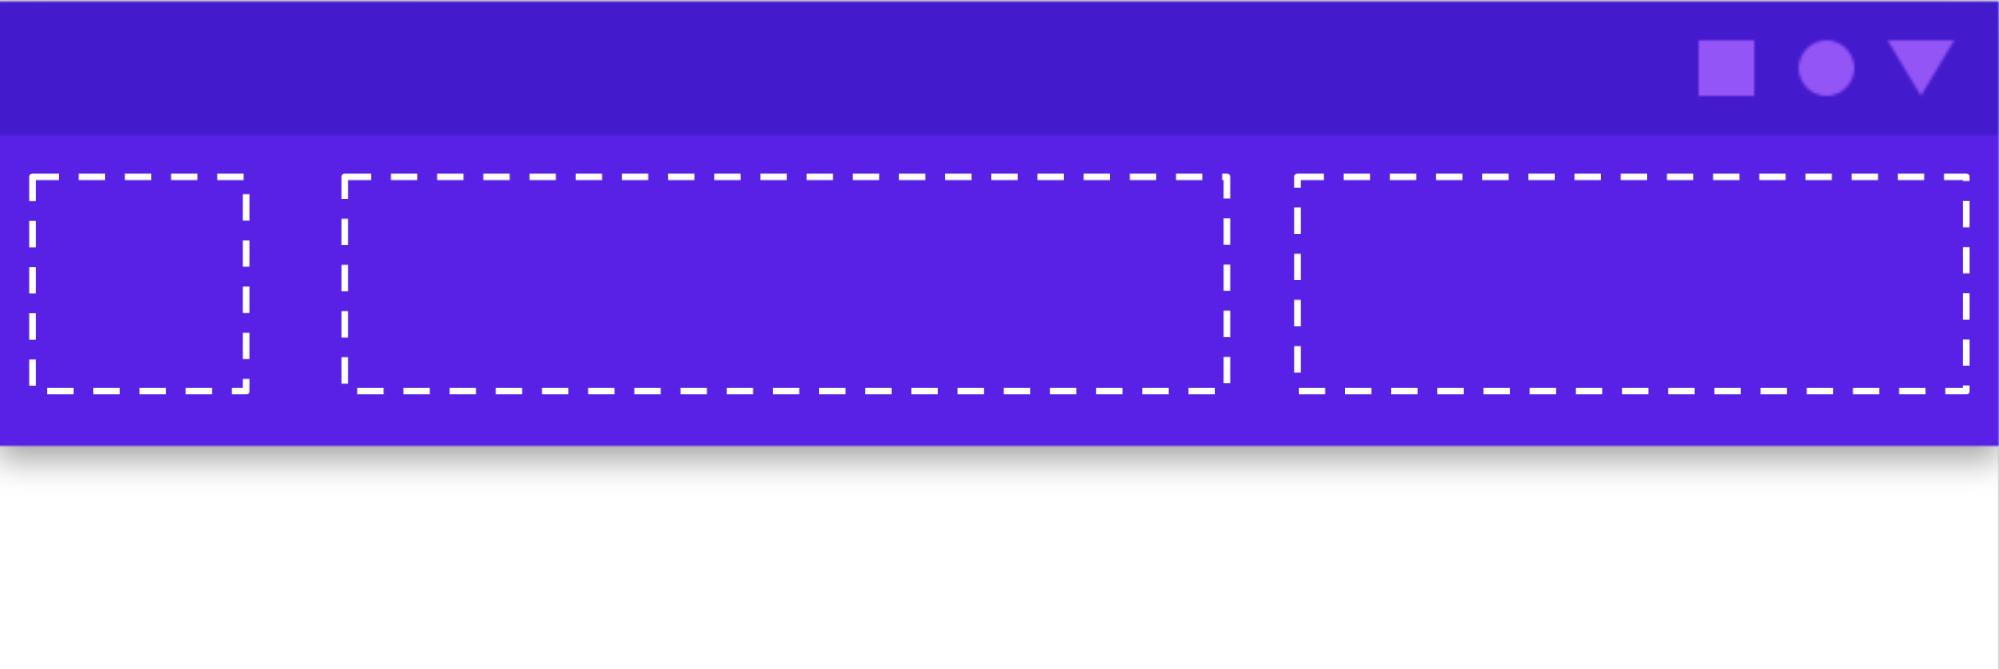 UI 要素を追加できるアプリバーのスロットを示しています